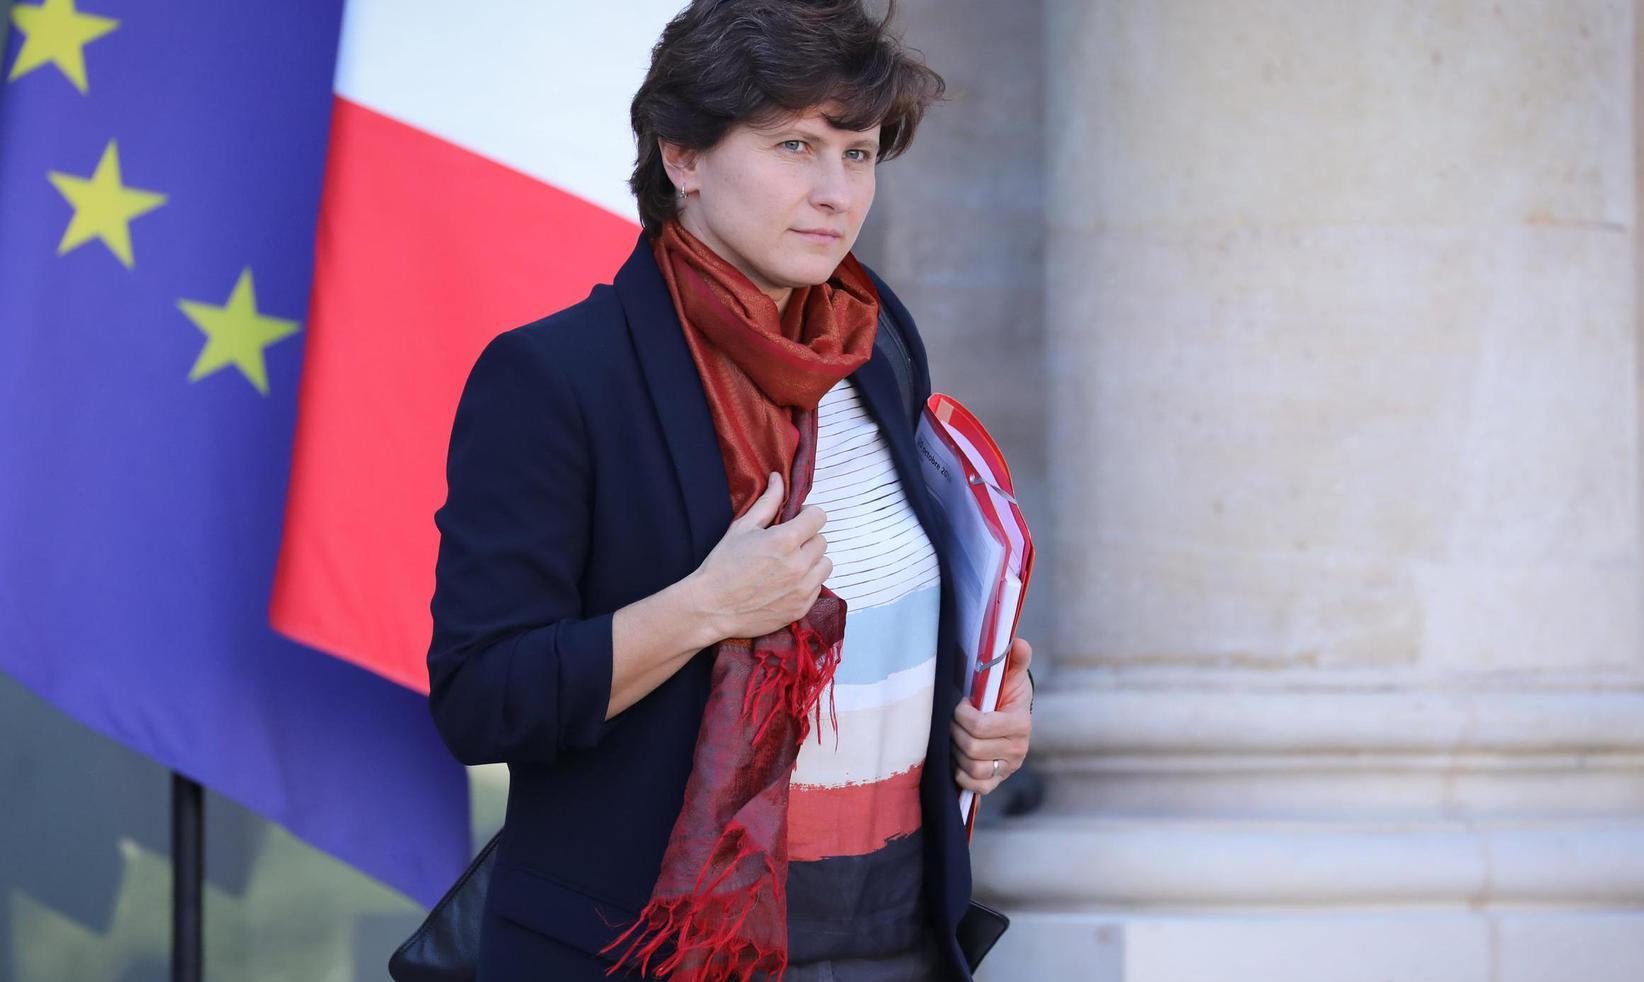 Sandrine Lefèvre